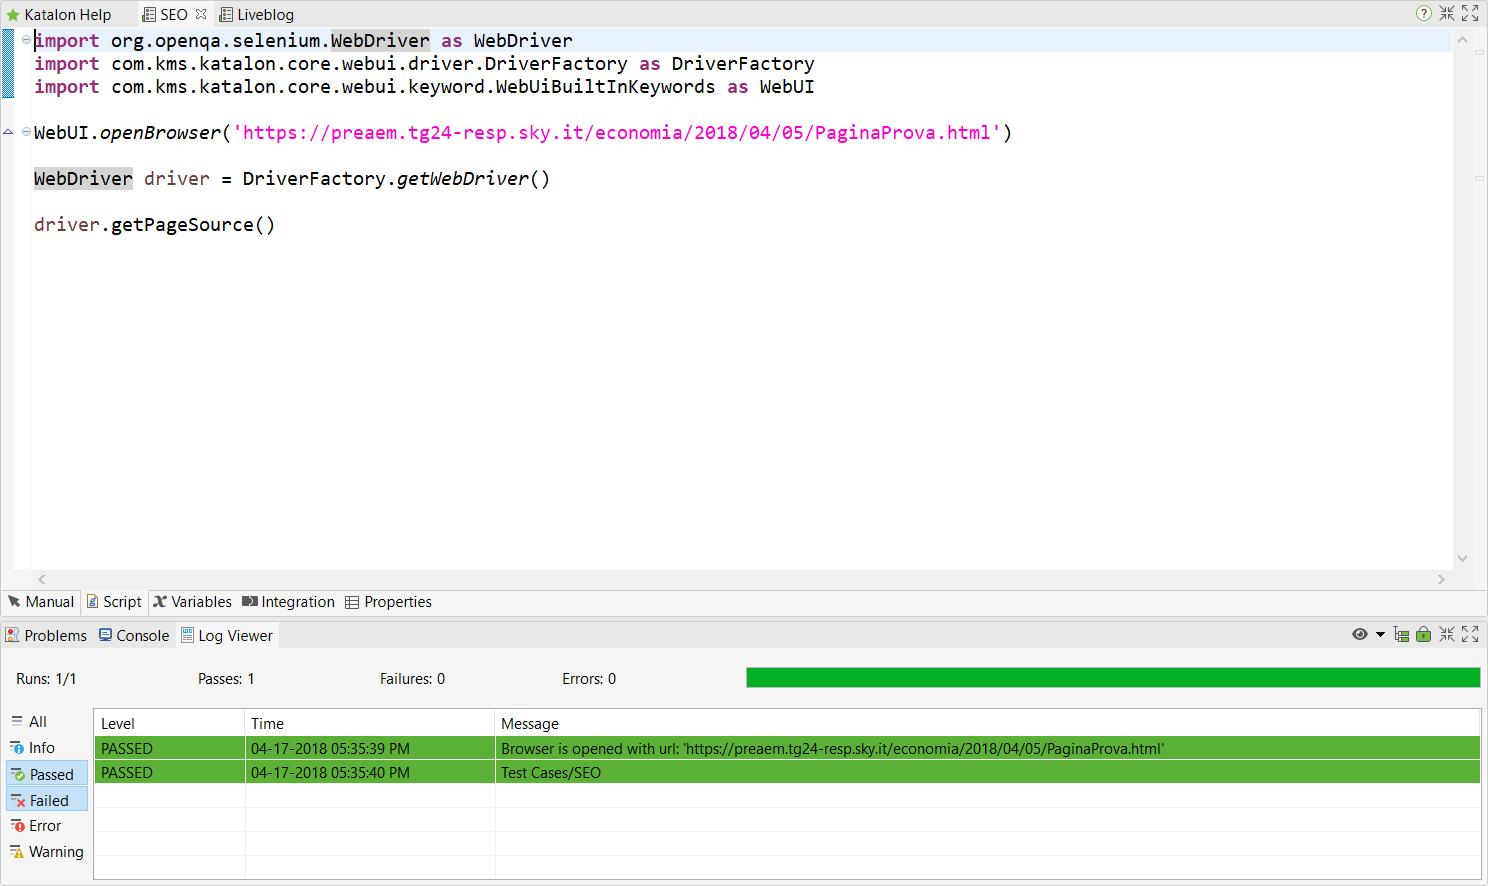 HTML of a web page - Web Testing - Katalon Community